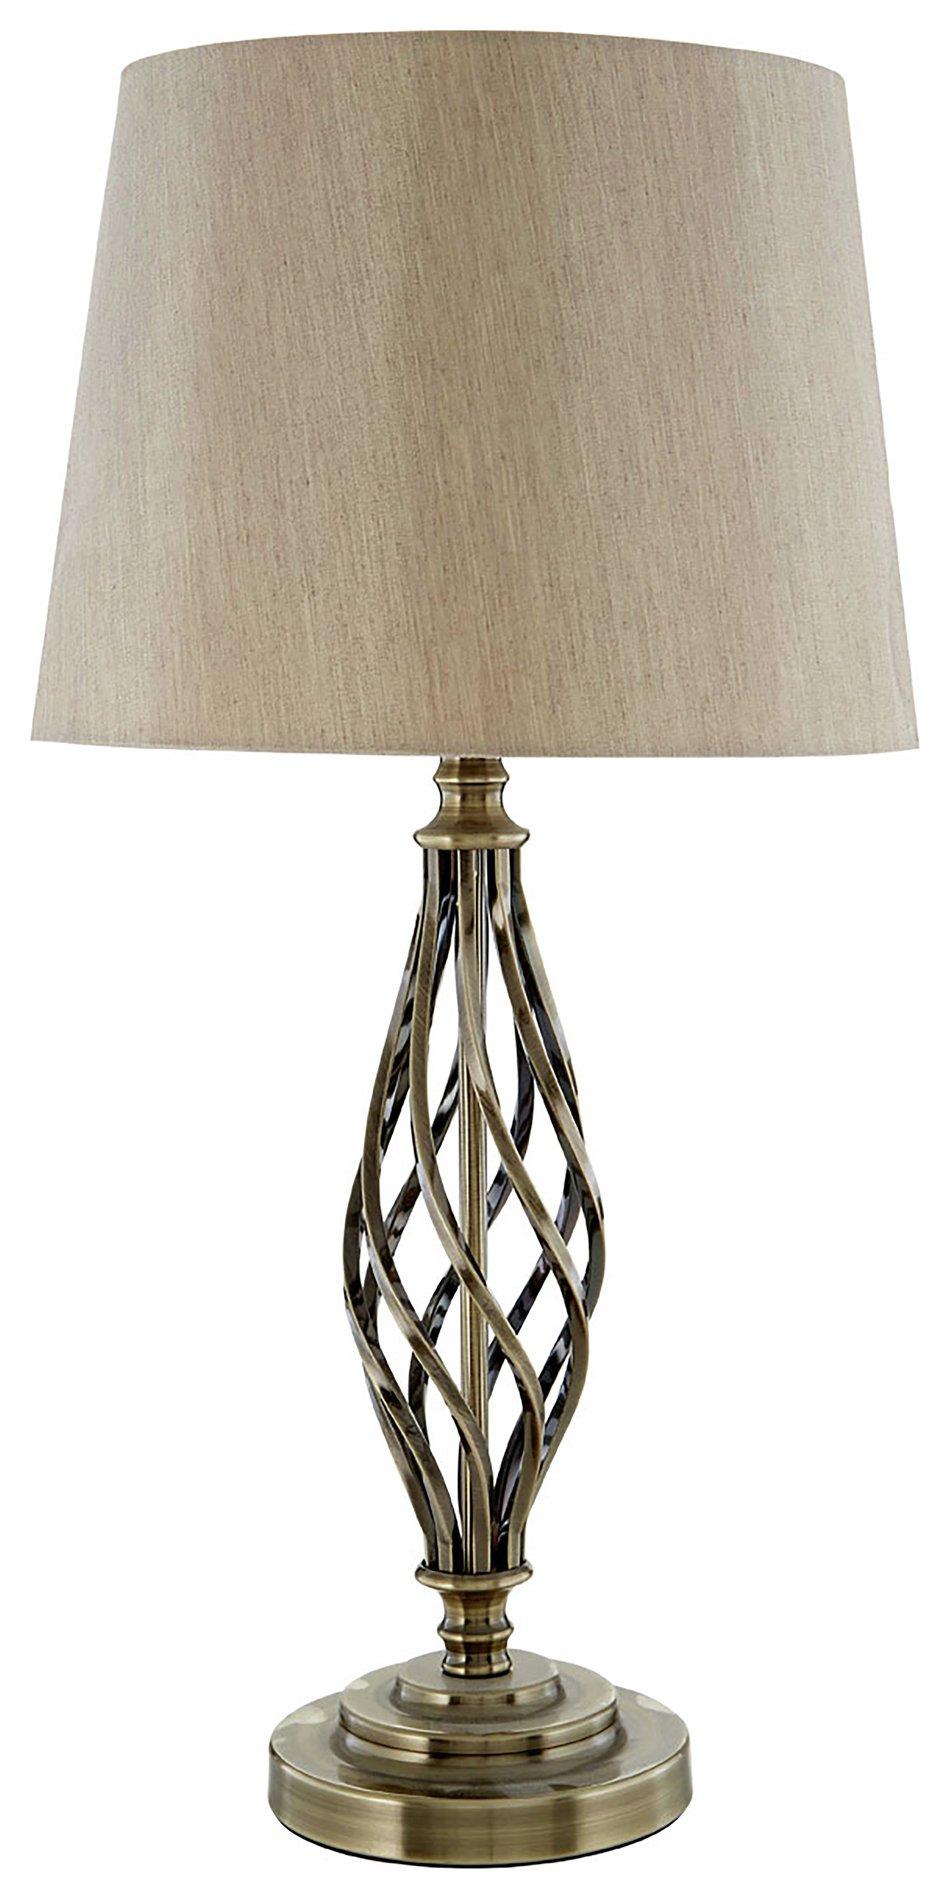 Image of Jakinda - Table Lamp - Antique Brass